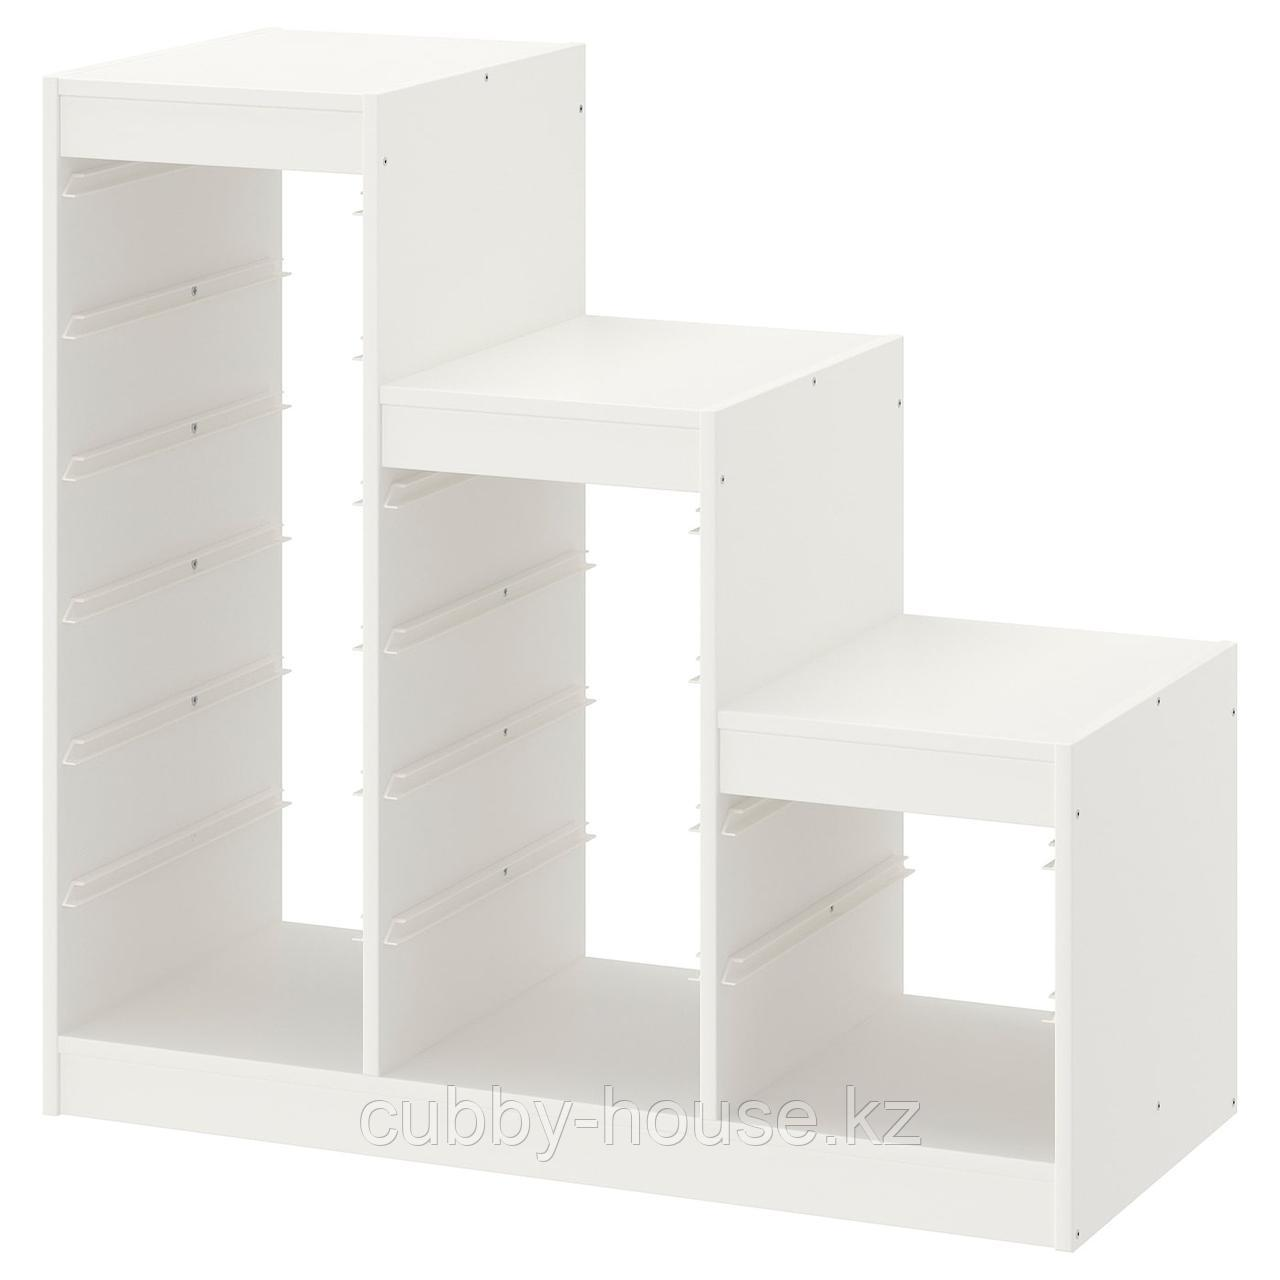 ТРУФАСТ Каркас, белый, 99x44x94 см